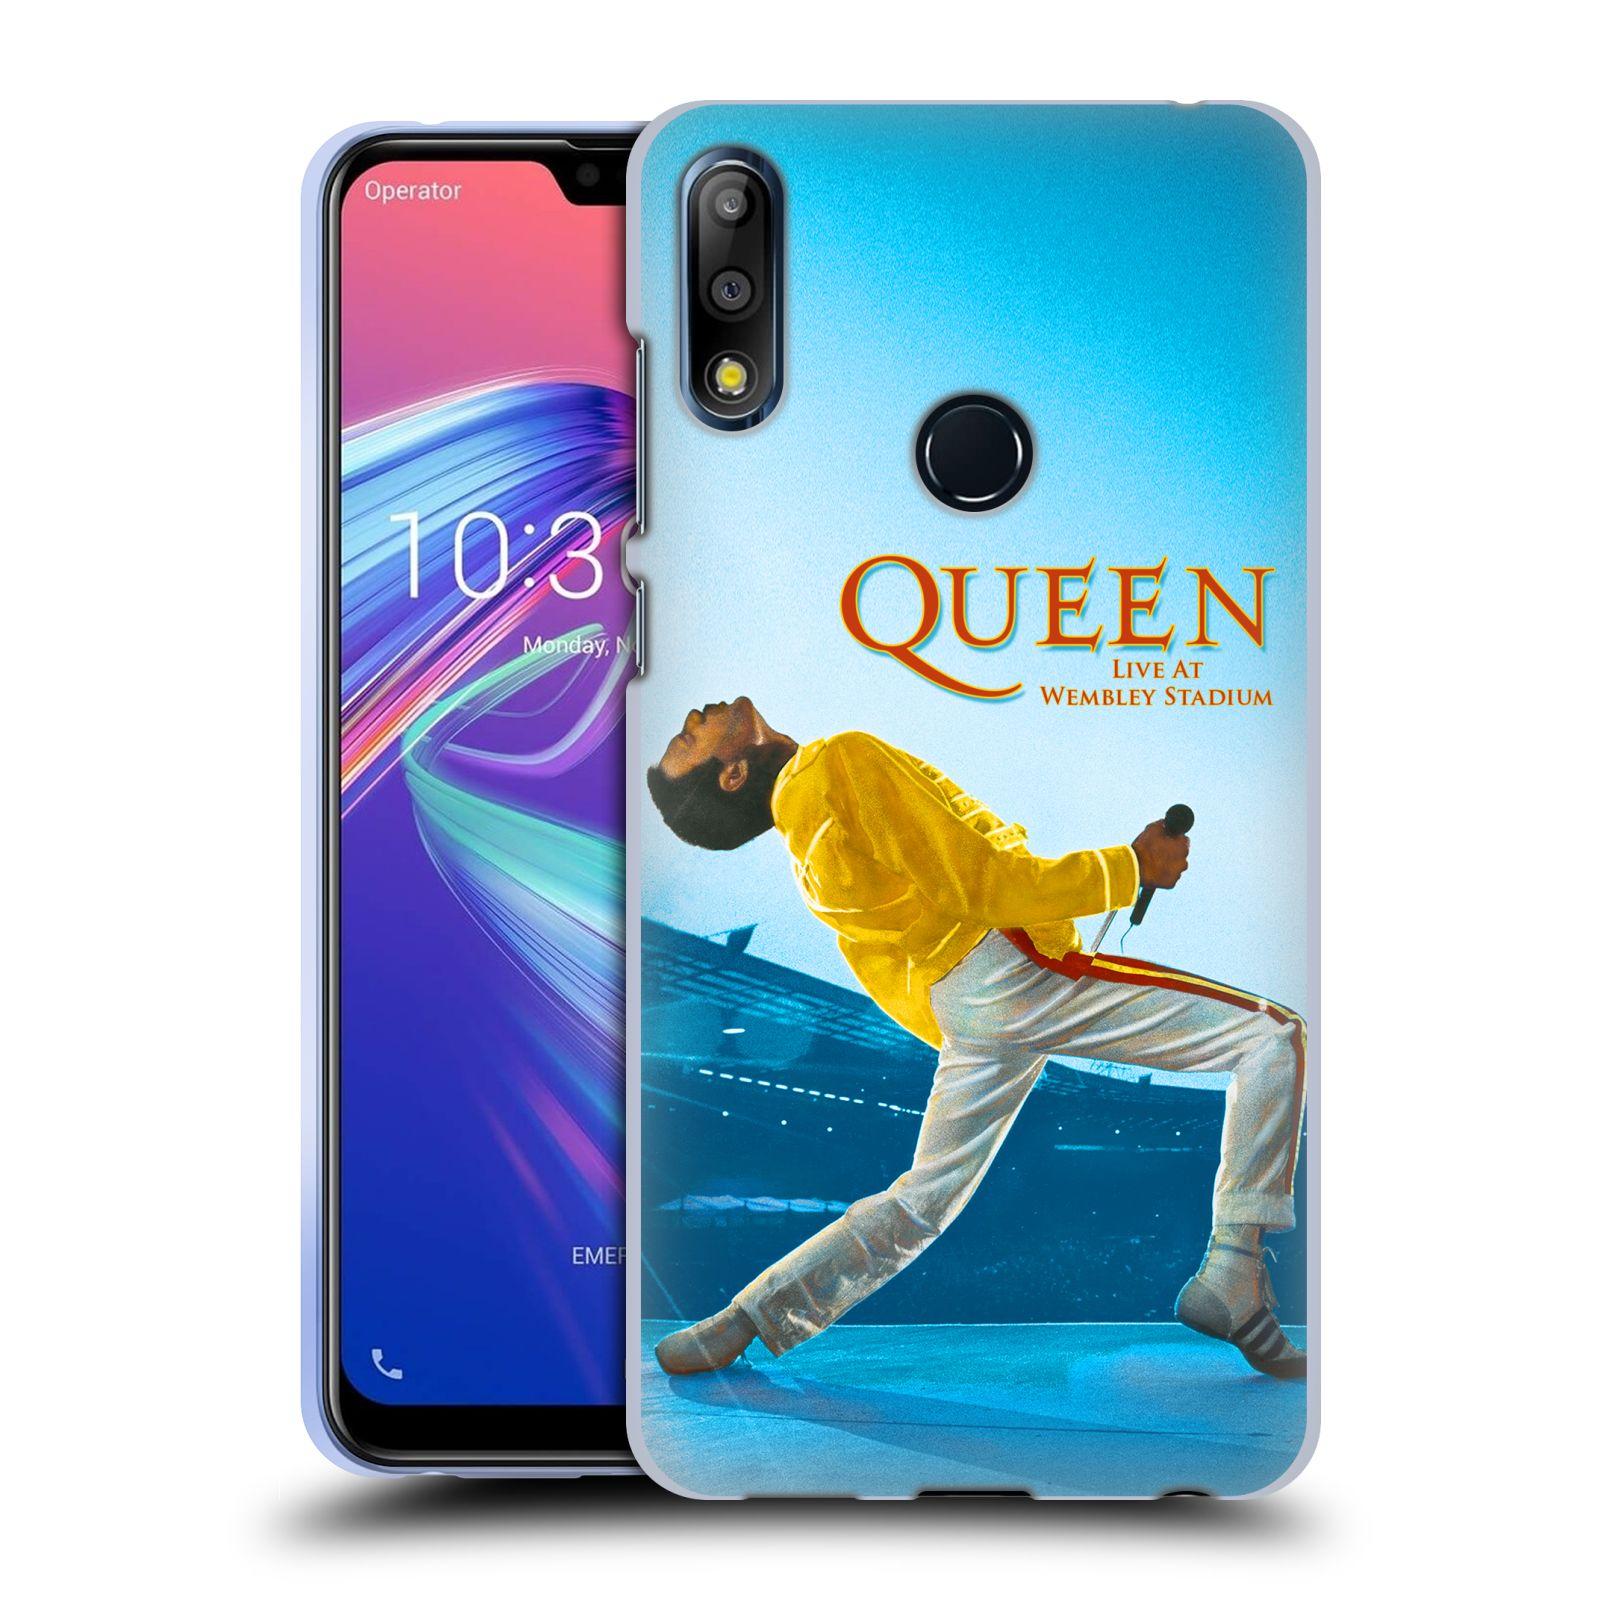 Silikonové pouzdro na mobil Asus Zenfone Max Pro M2 ZB631KL - Head Case - Queen - Freddie Mercury